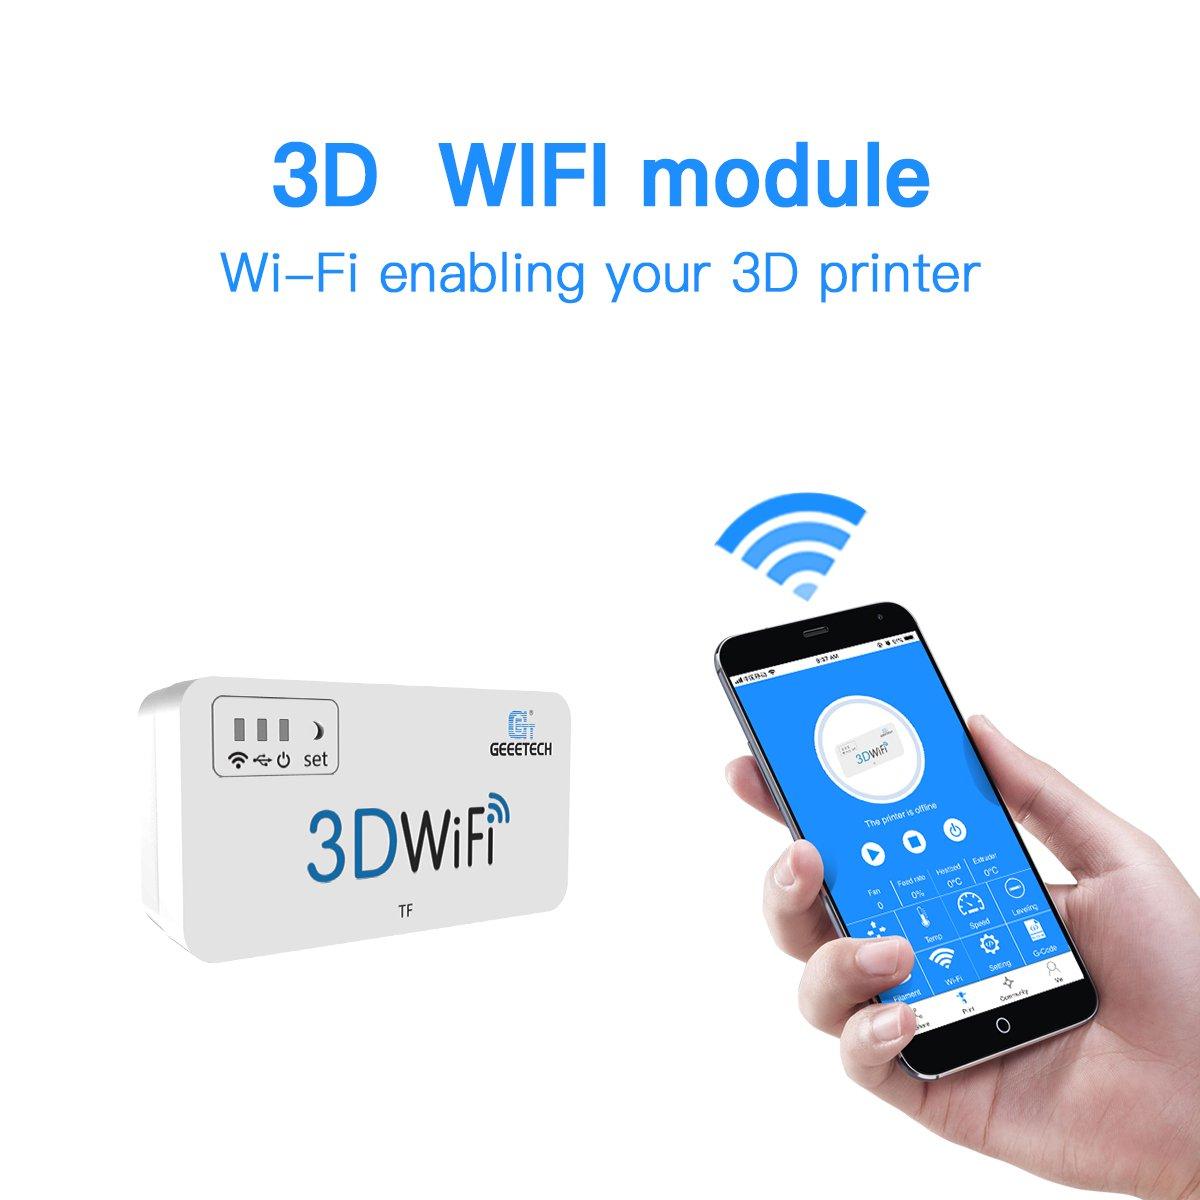 Geeetech Módulo Wifi 3D para impresora 3D, fácil de usar, sin ...